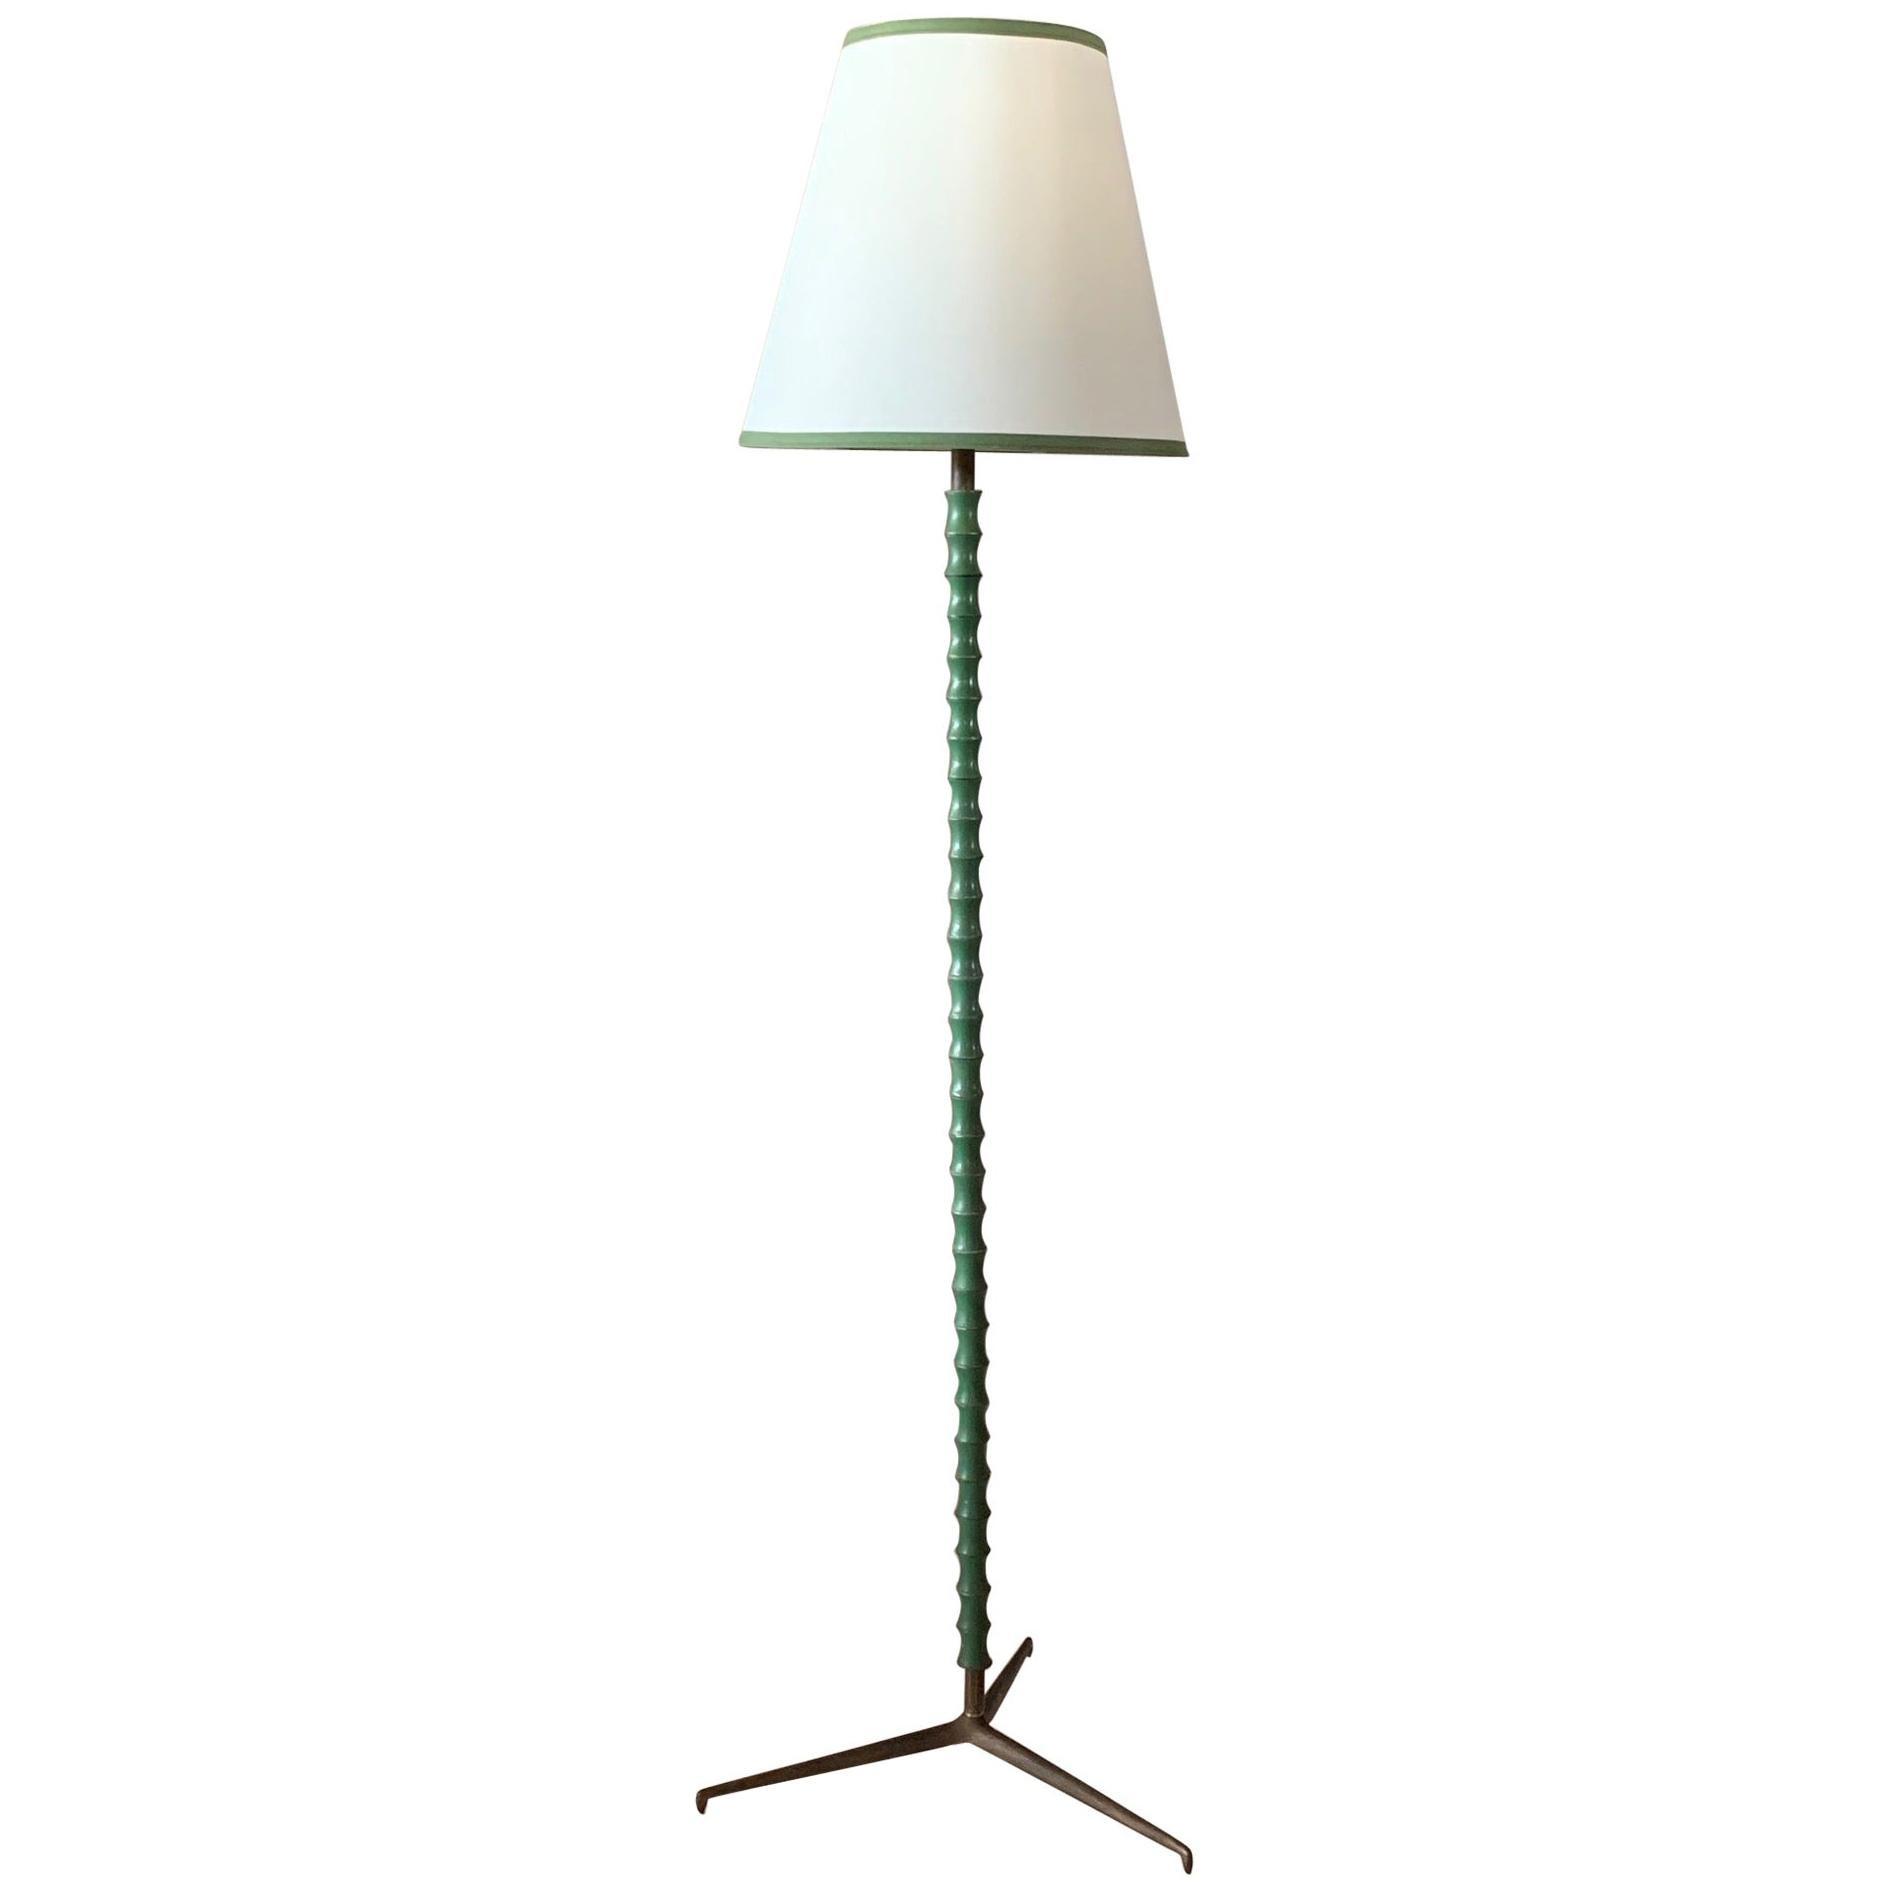 Rare Gino Sarfatti for Arteluce Floor Lamp